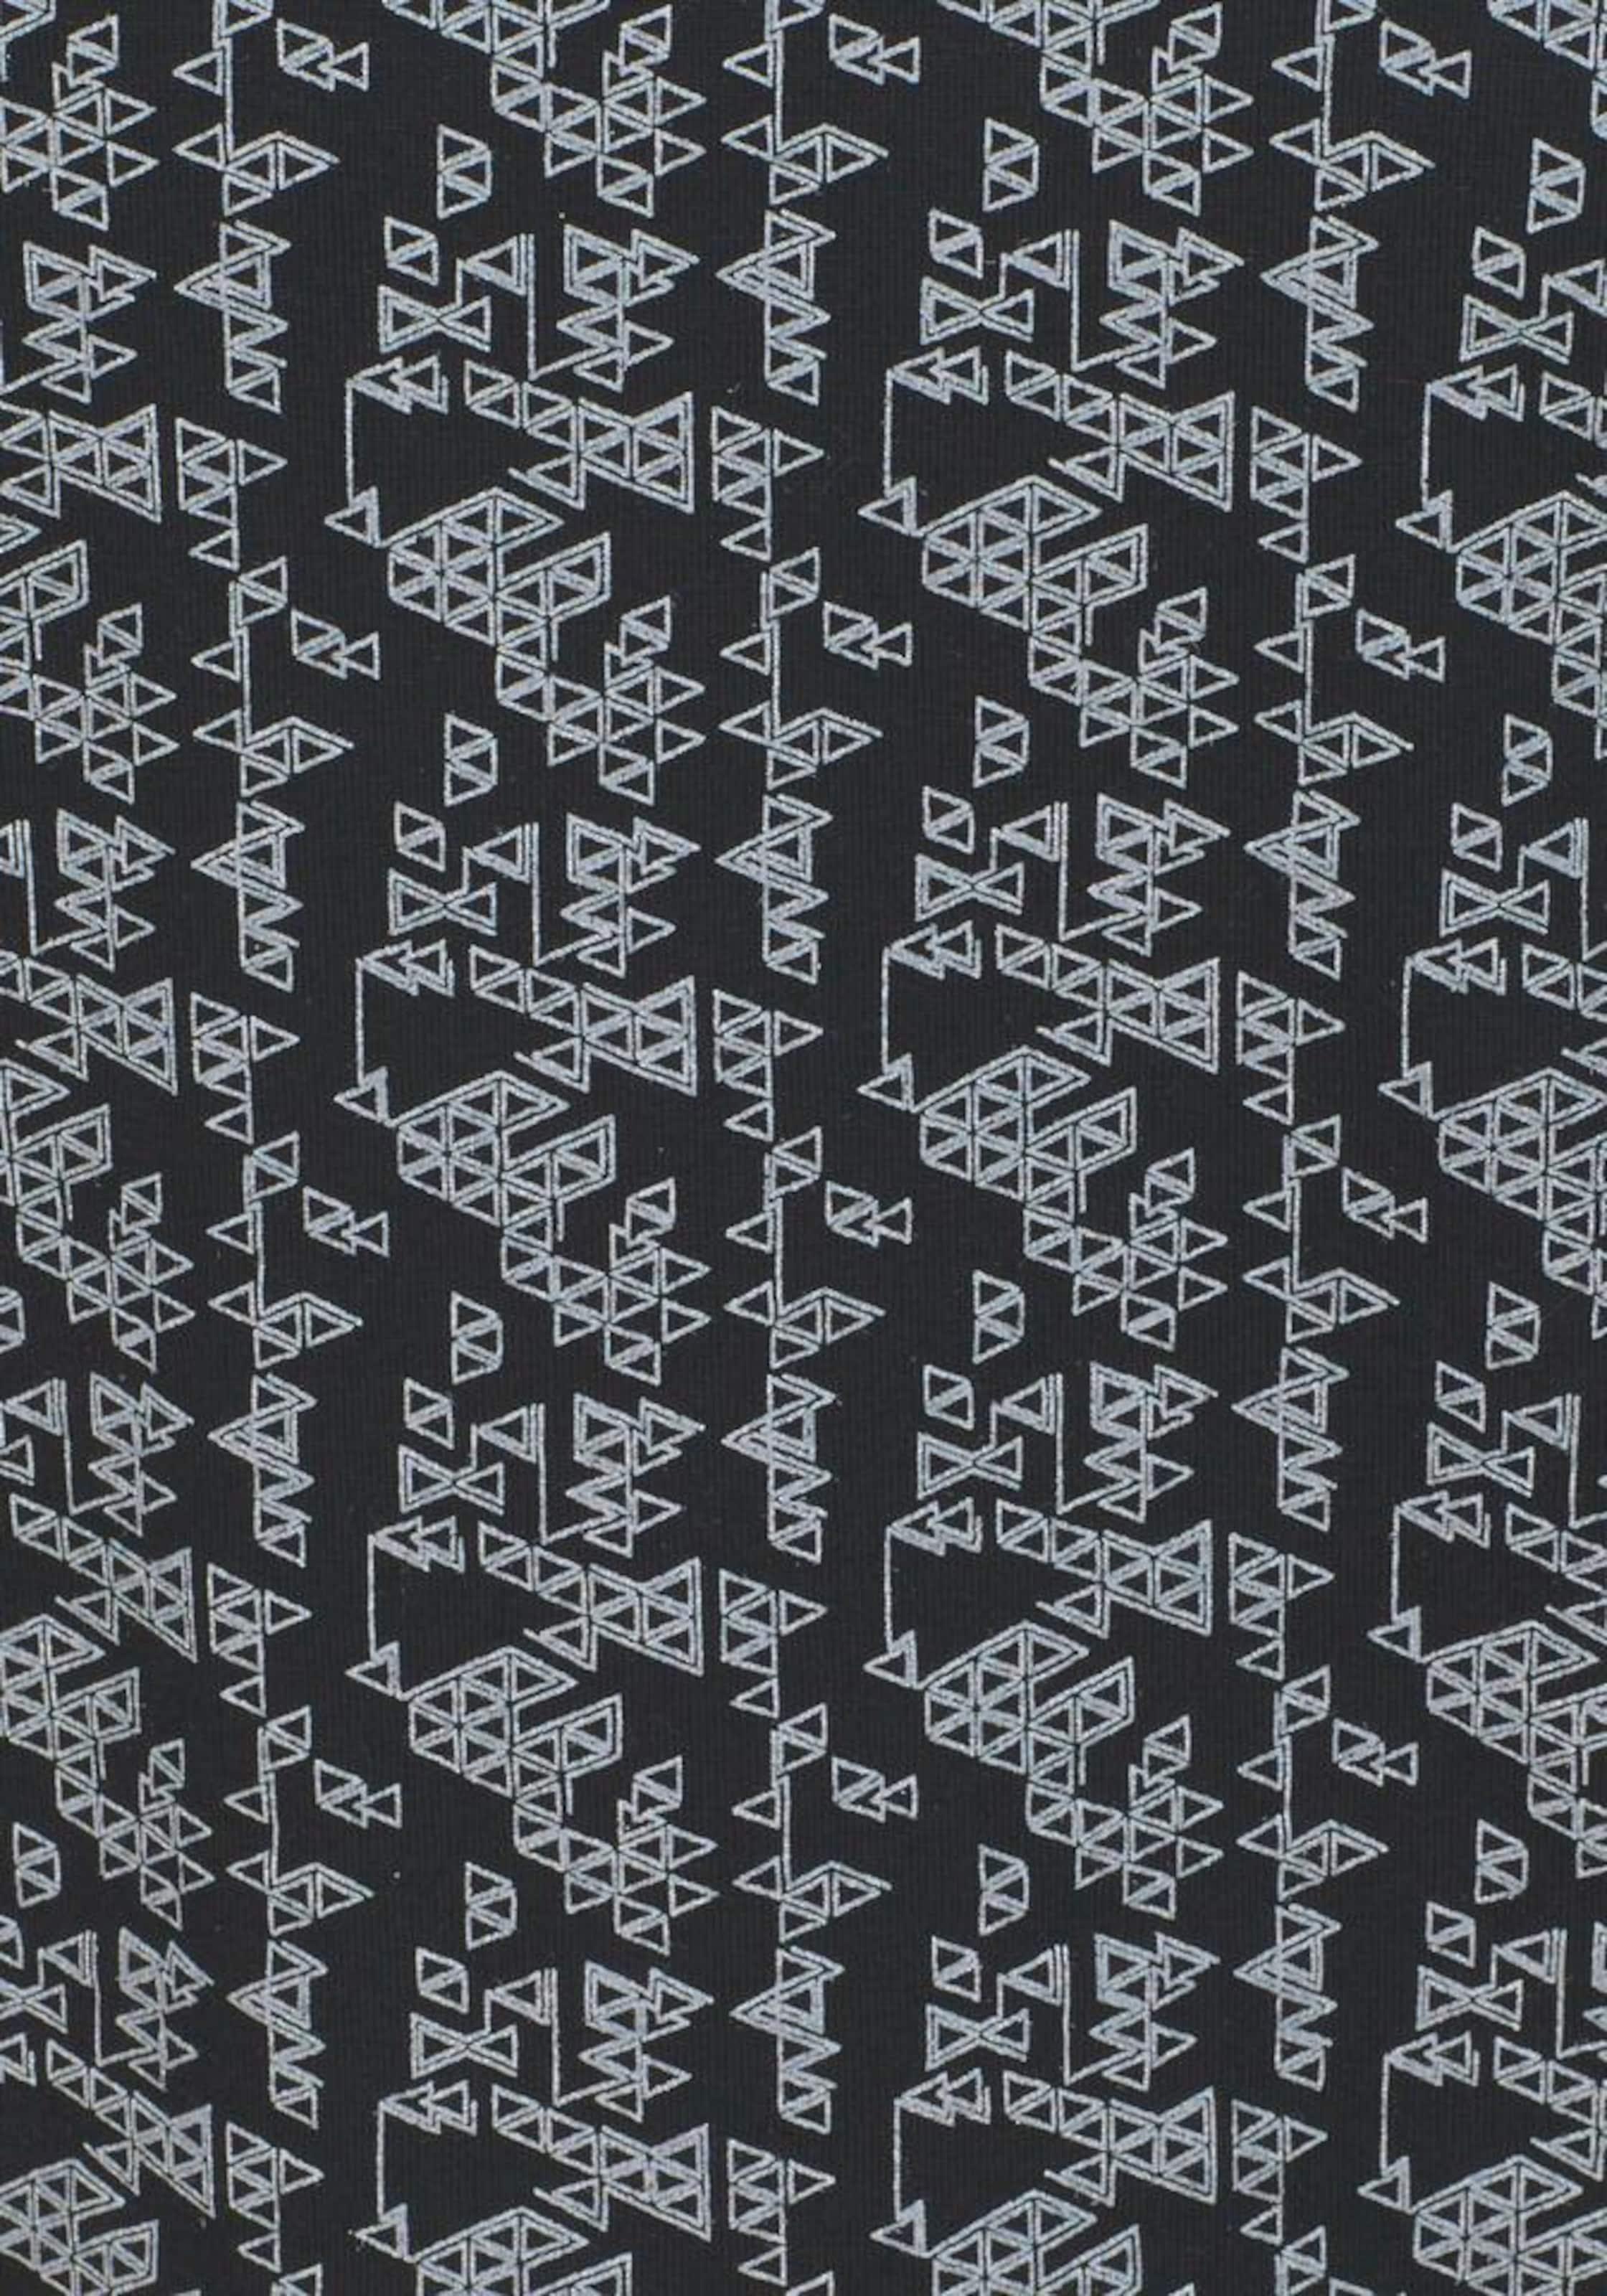 H.I.S T-Shirt Günstig Kaufen Fabrikverkauf 1UaPc5I0v